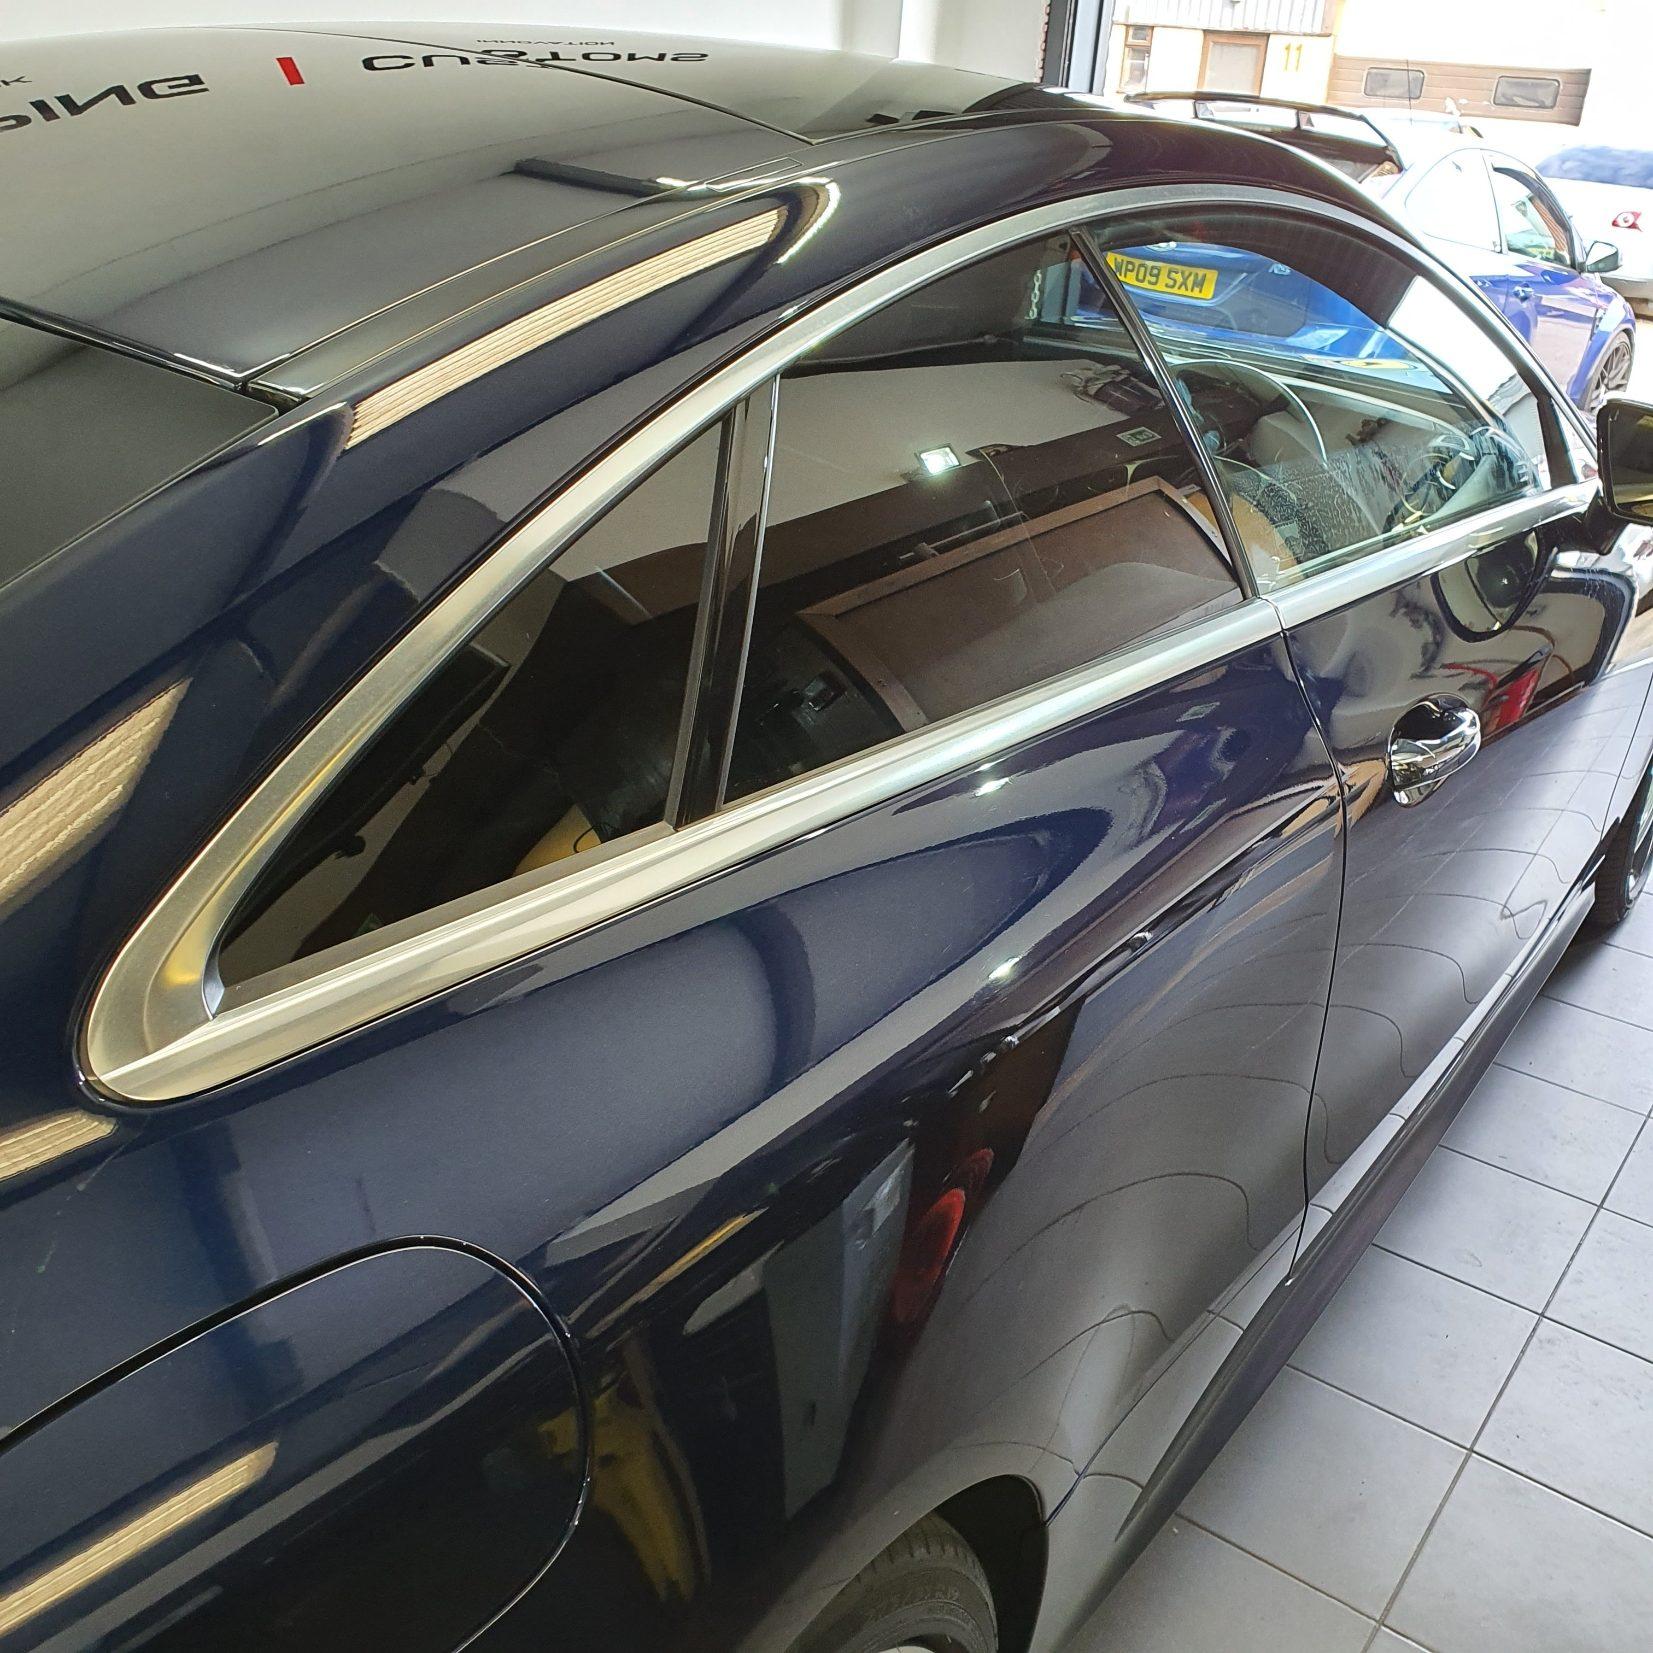 Mercedes Trim Dechrome - before